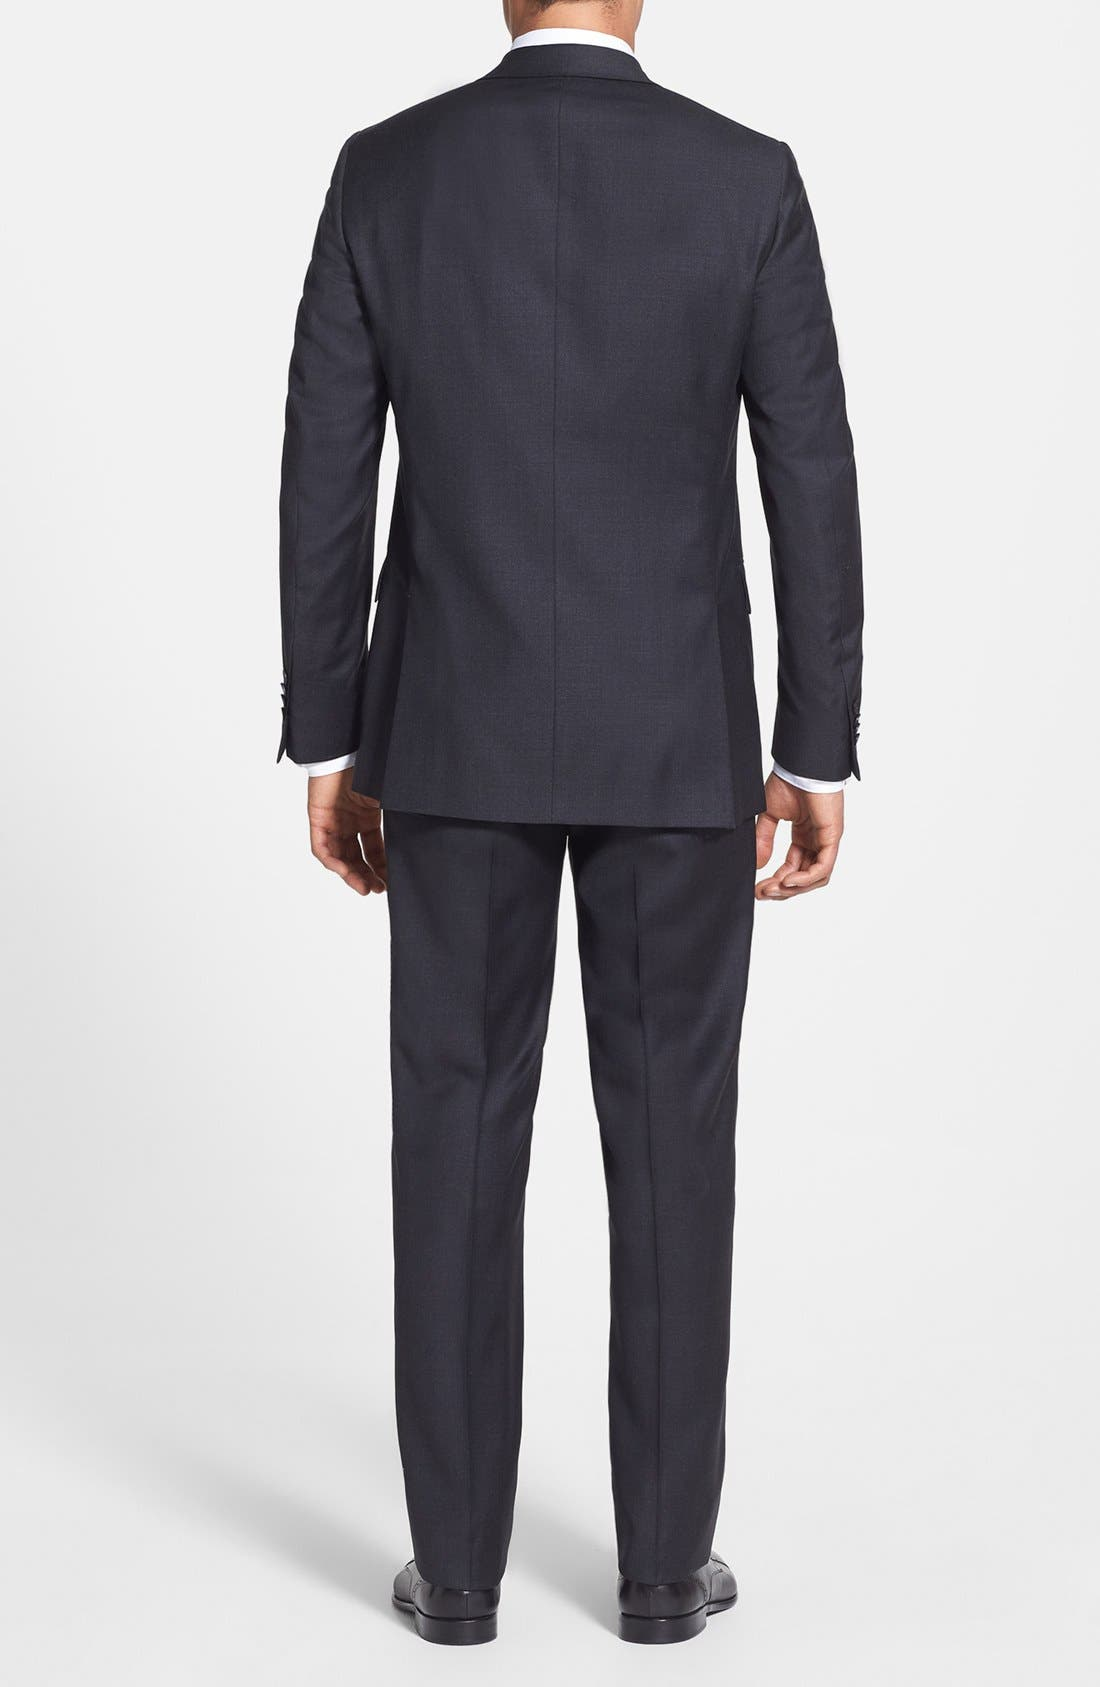 Men's Clothing | Nordstrom